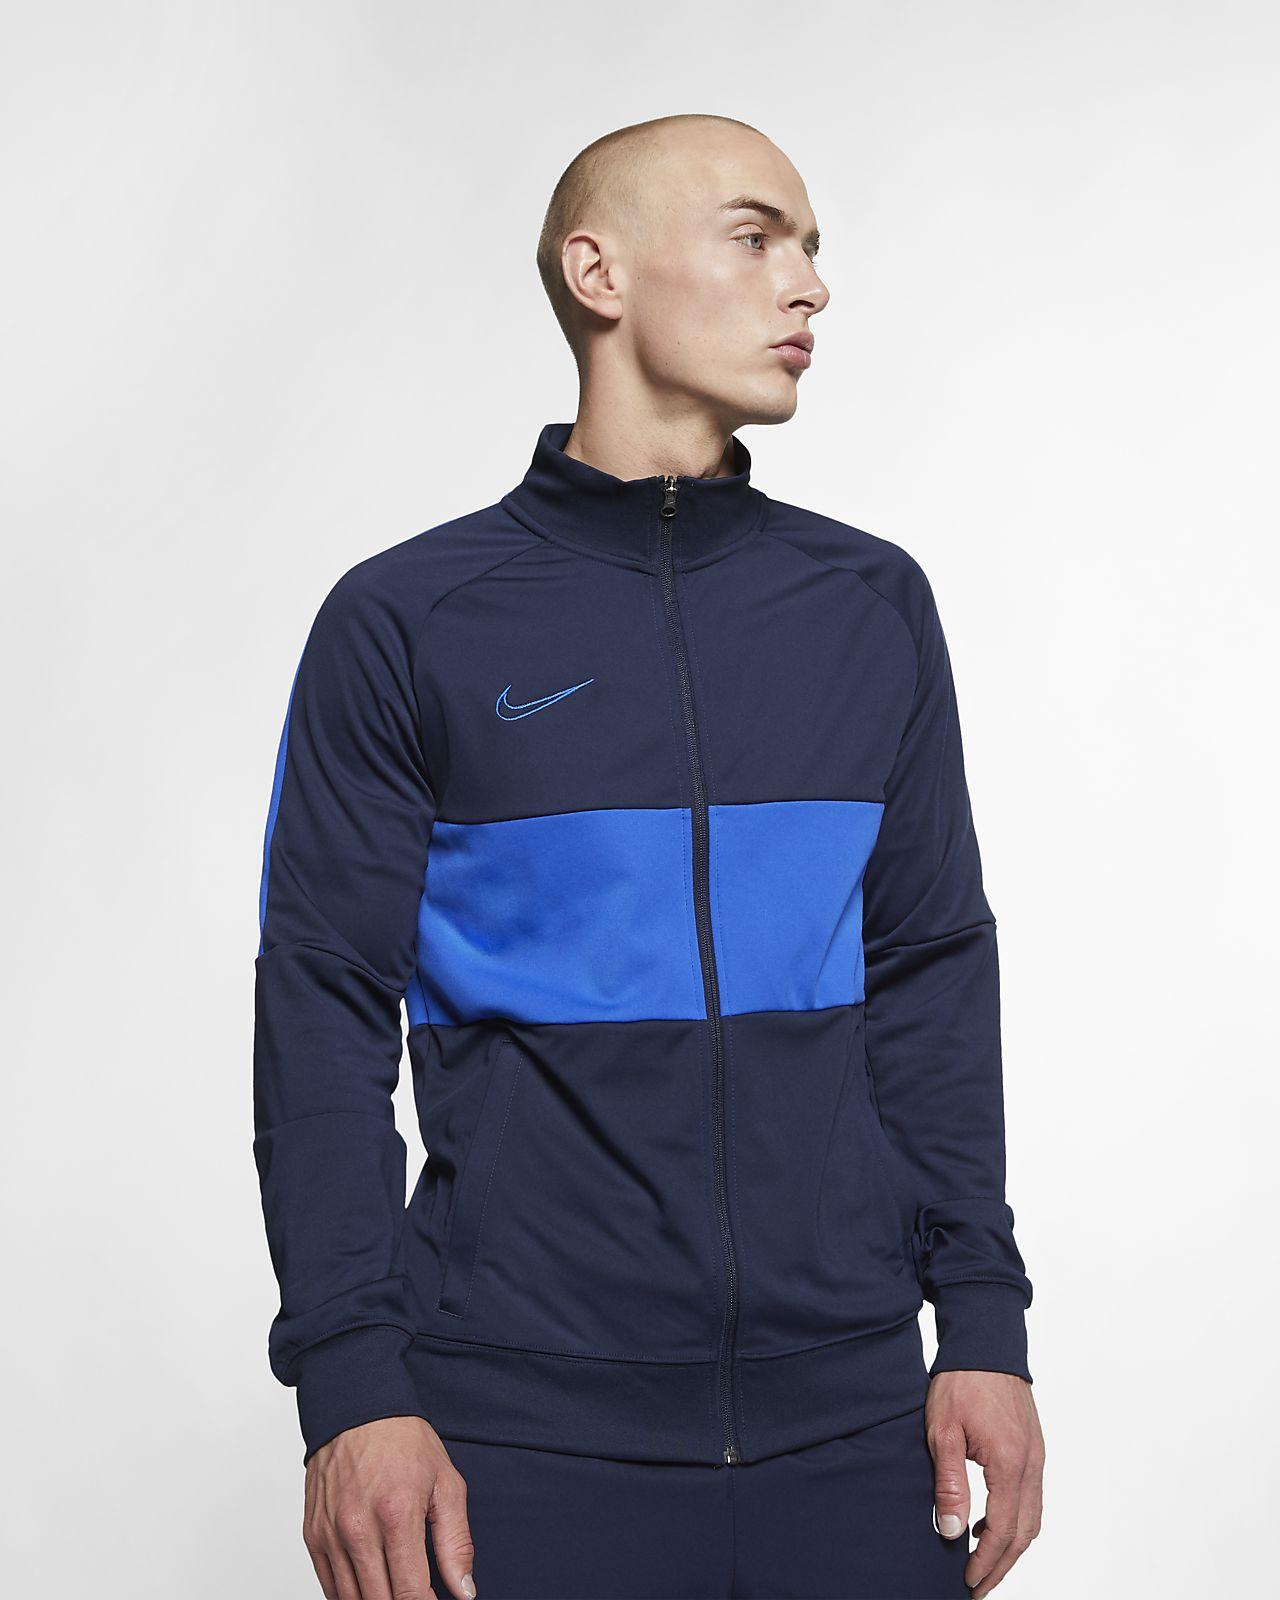 Academy Fit Herren Dri Fußballjacke Nike ET4q8w6xf